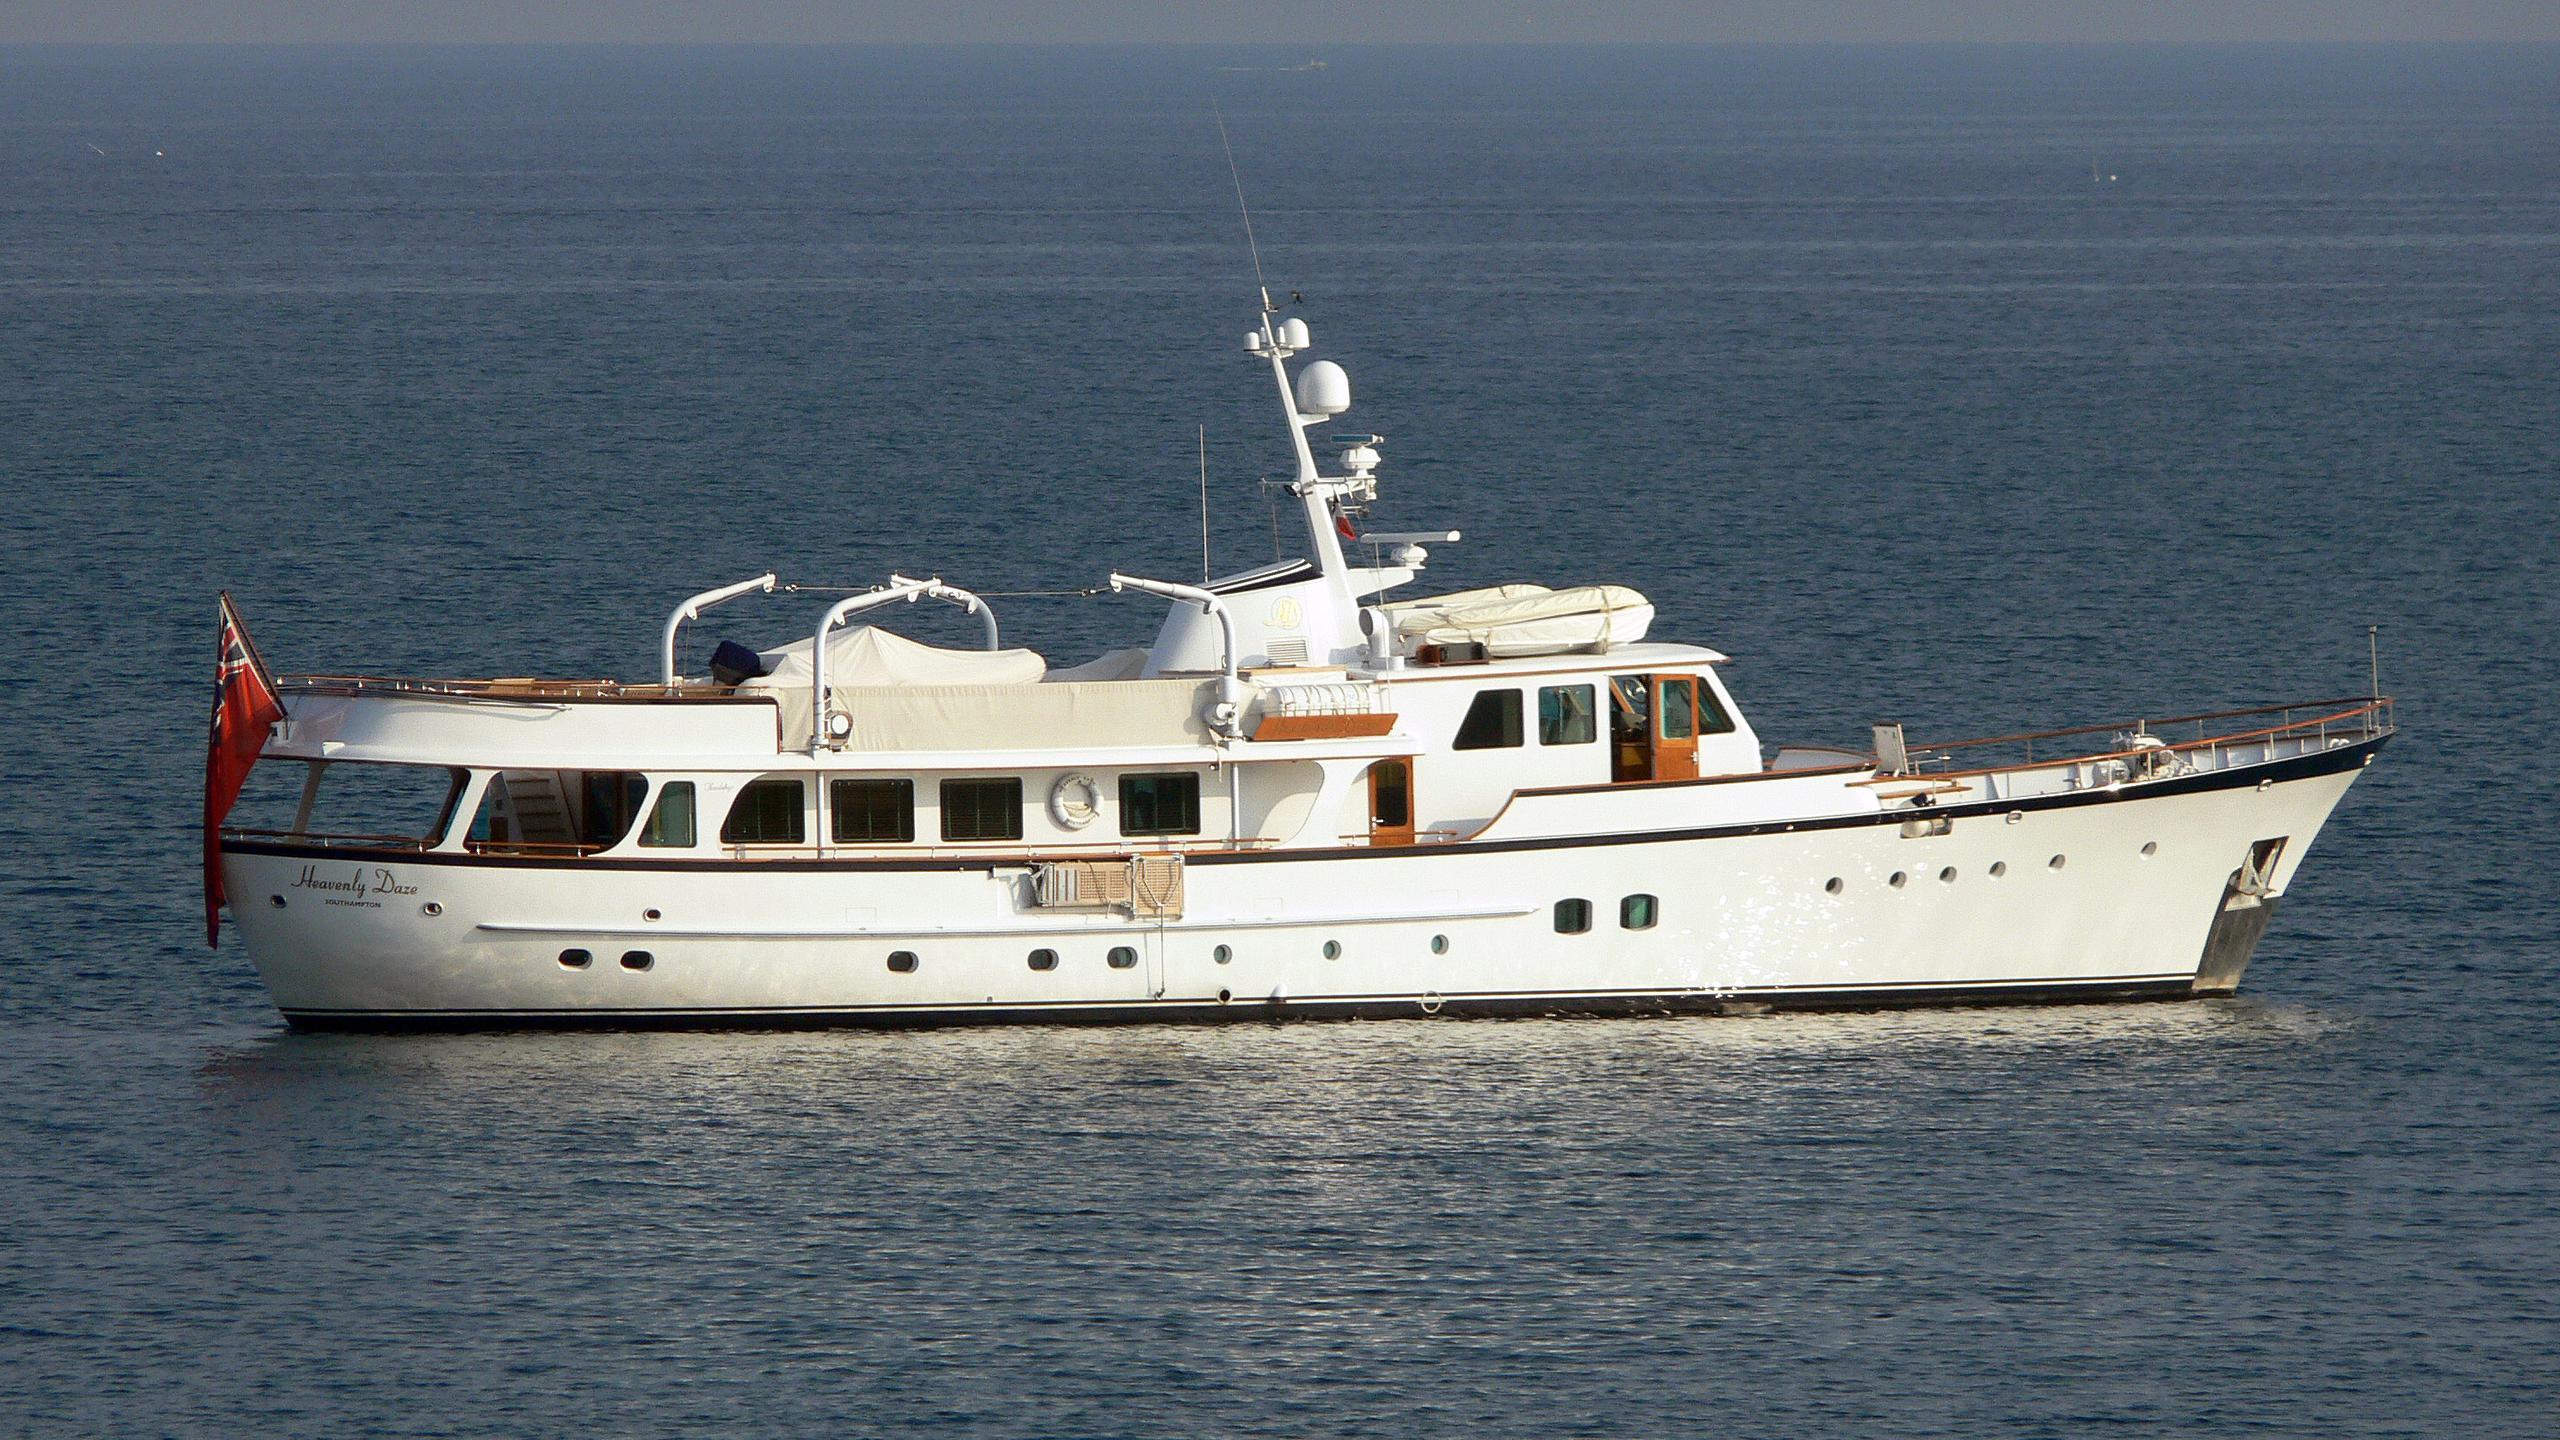 heavenly-daze-motor-yacht-feadship-1972-32m-profile